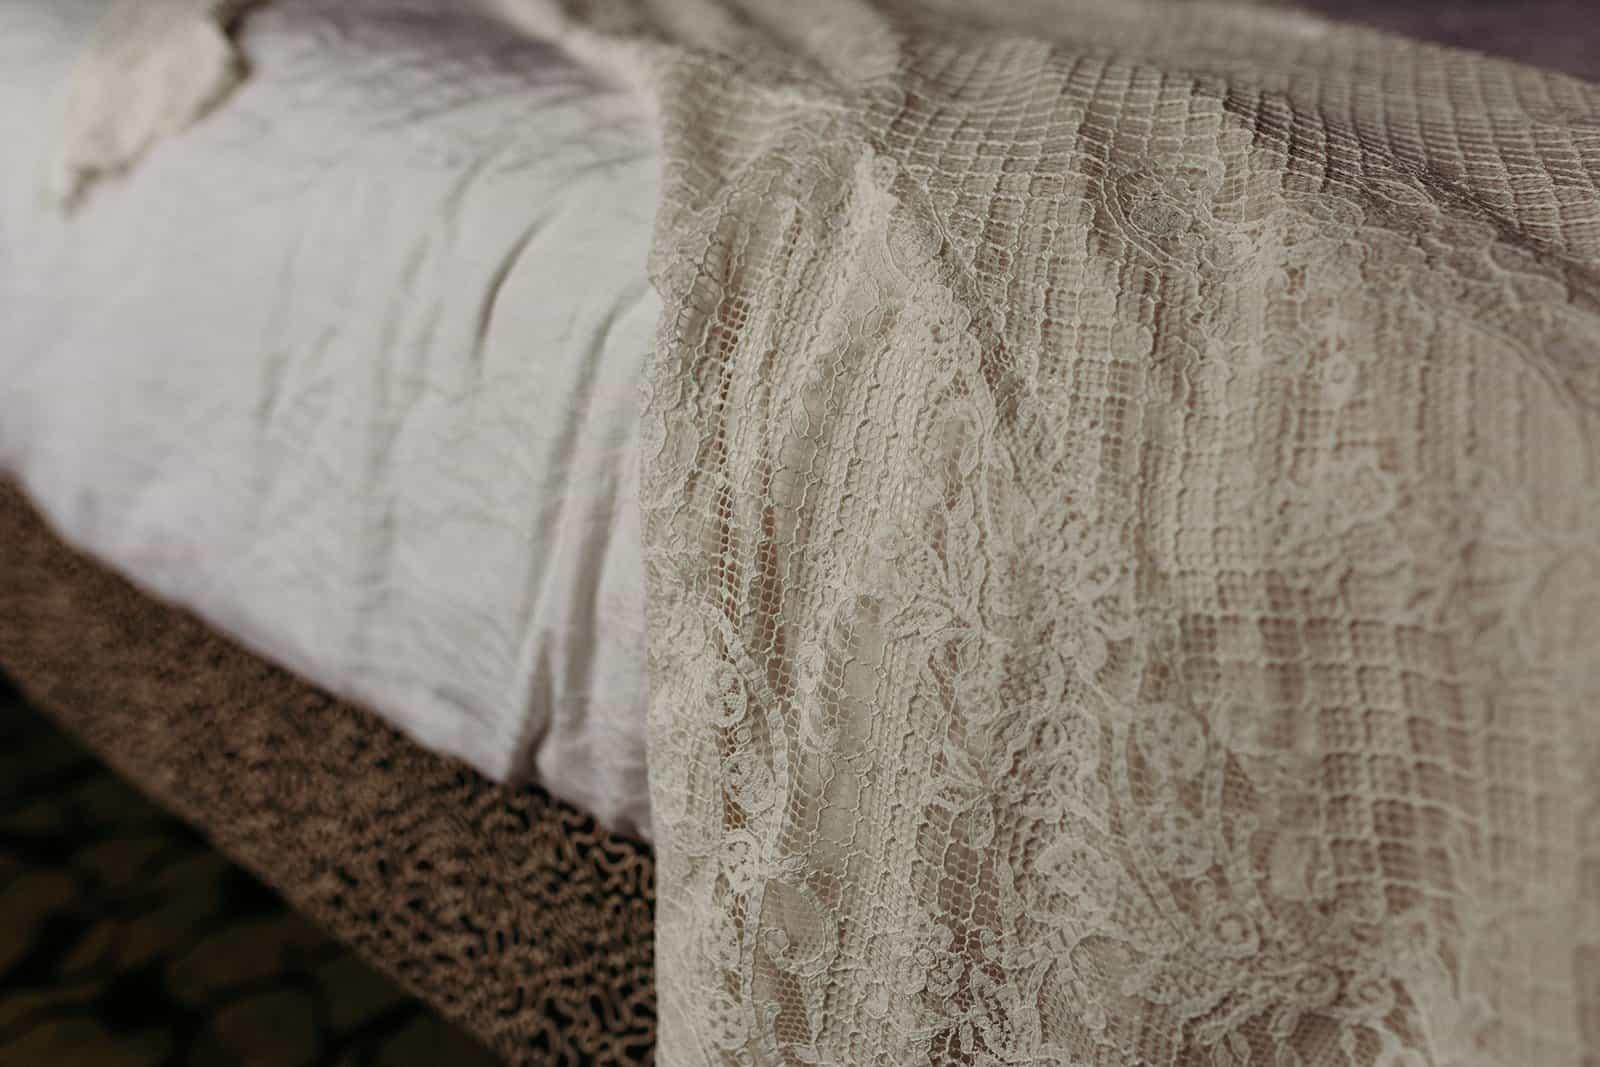 Detailed shot of wedding dress on bed